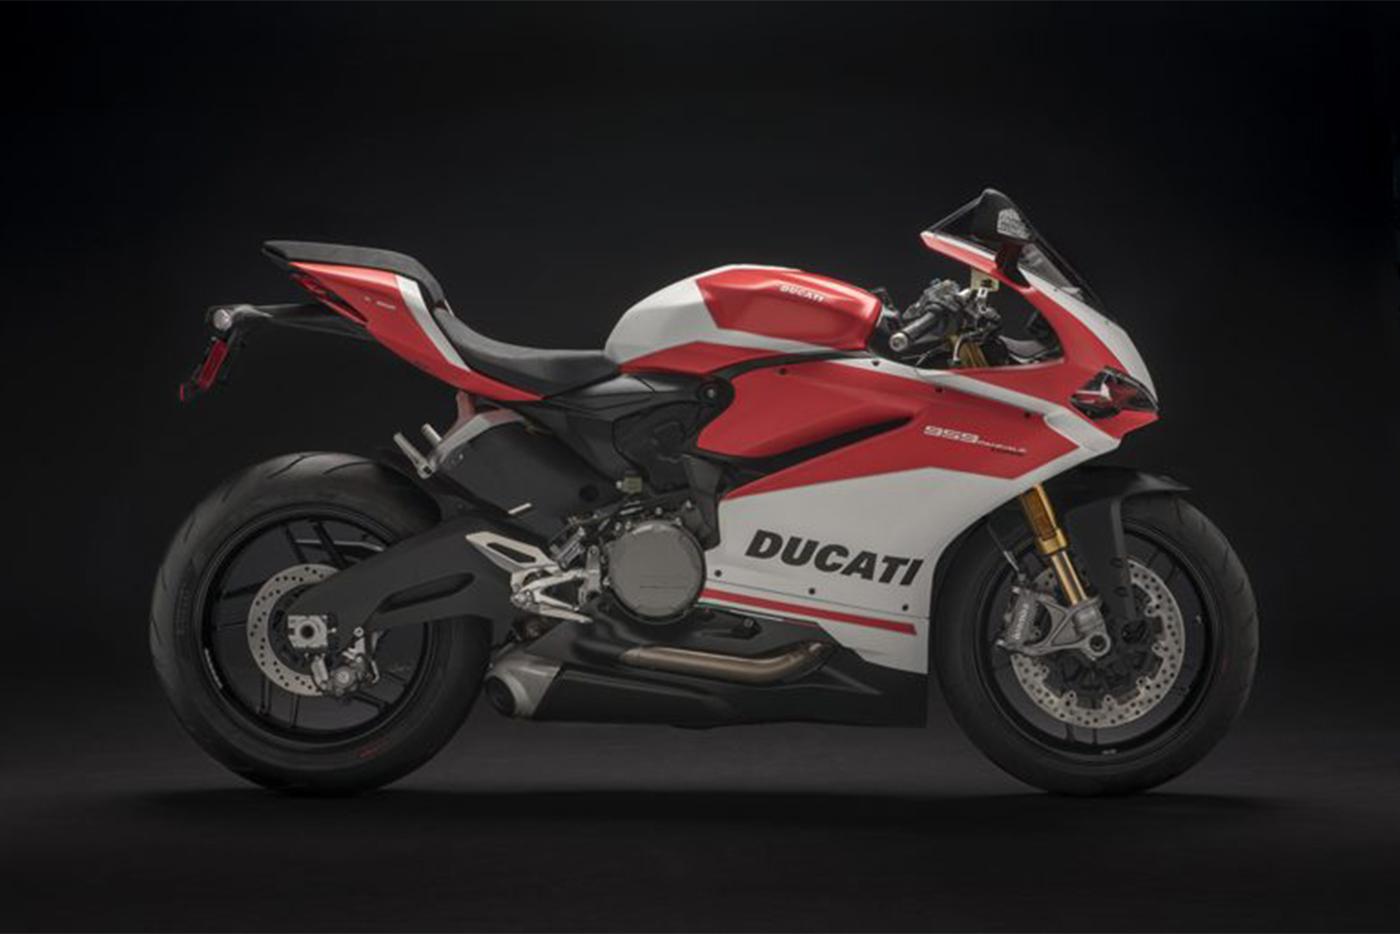 ducati-959-panigale-corse.jpg